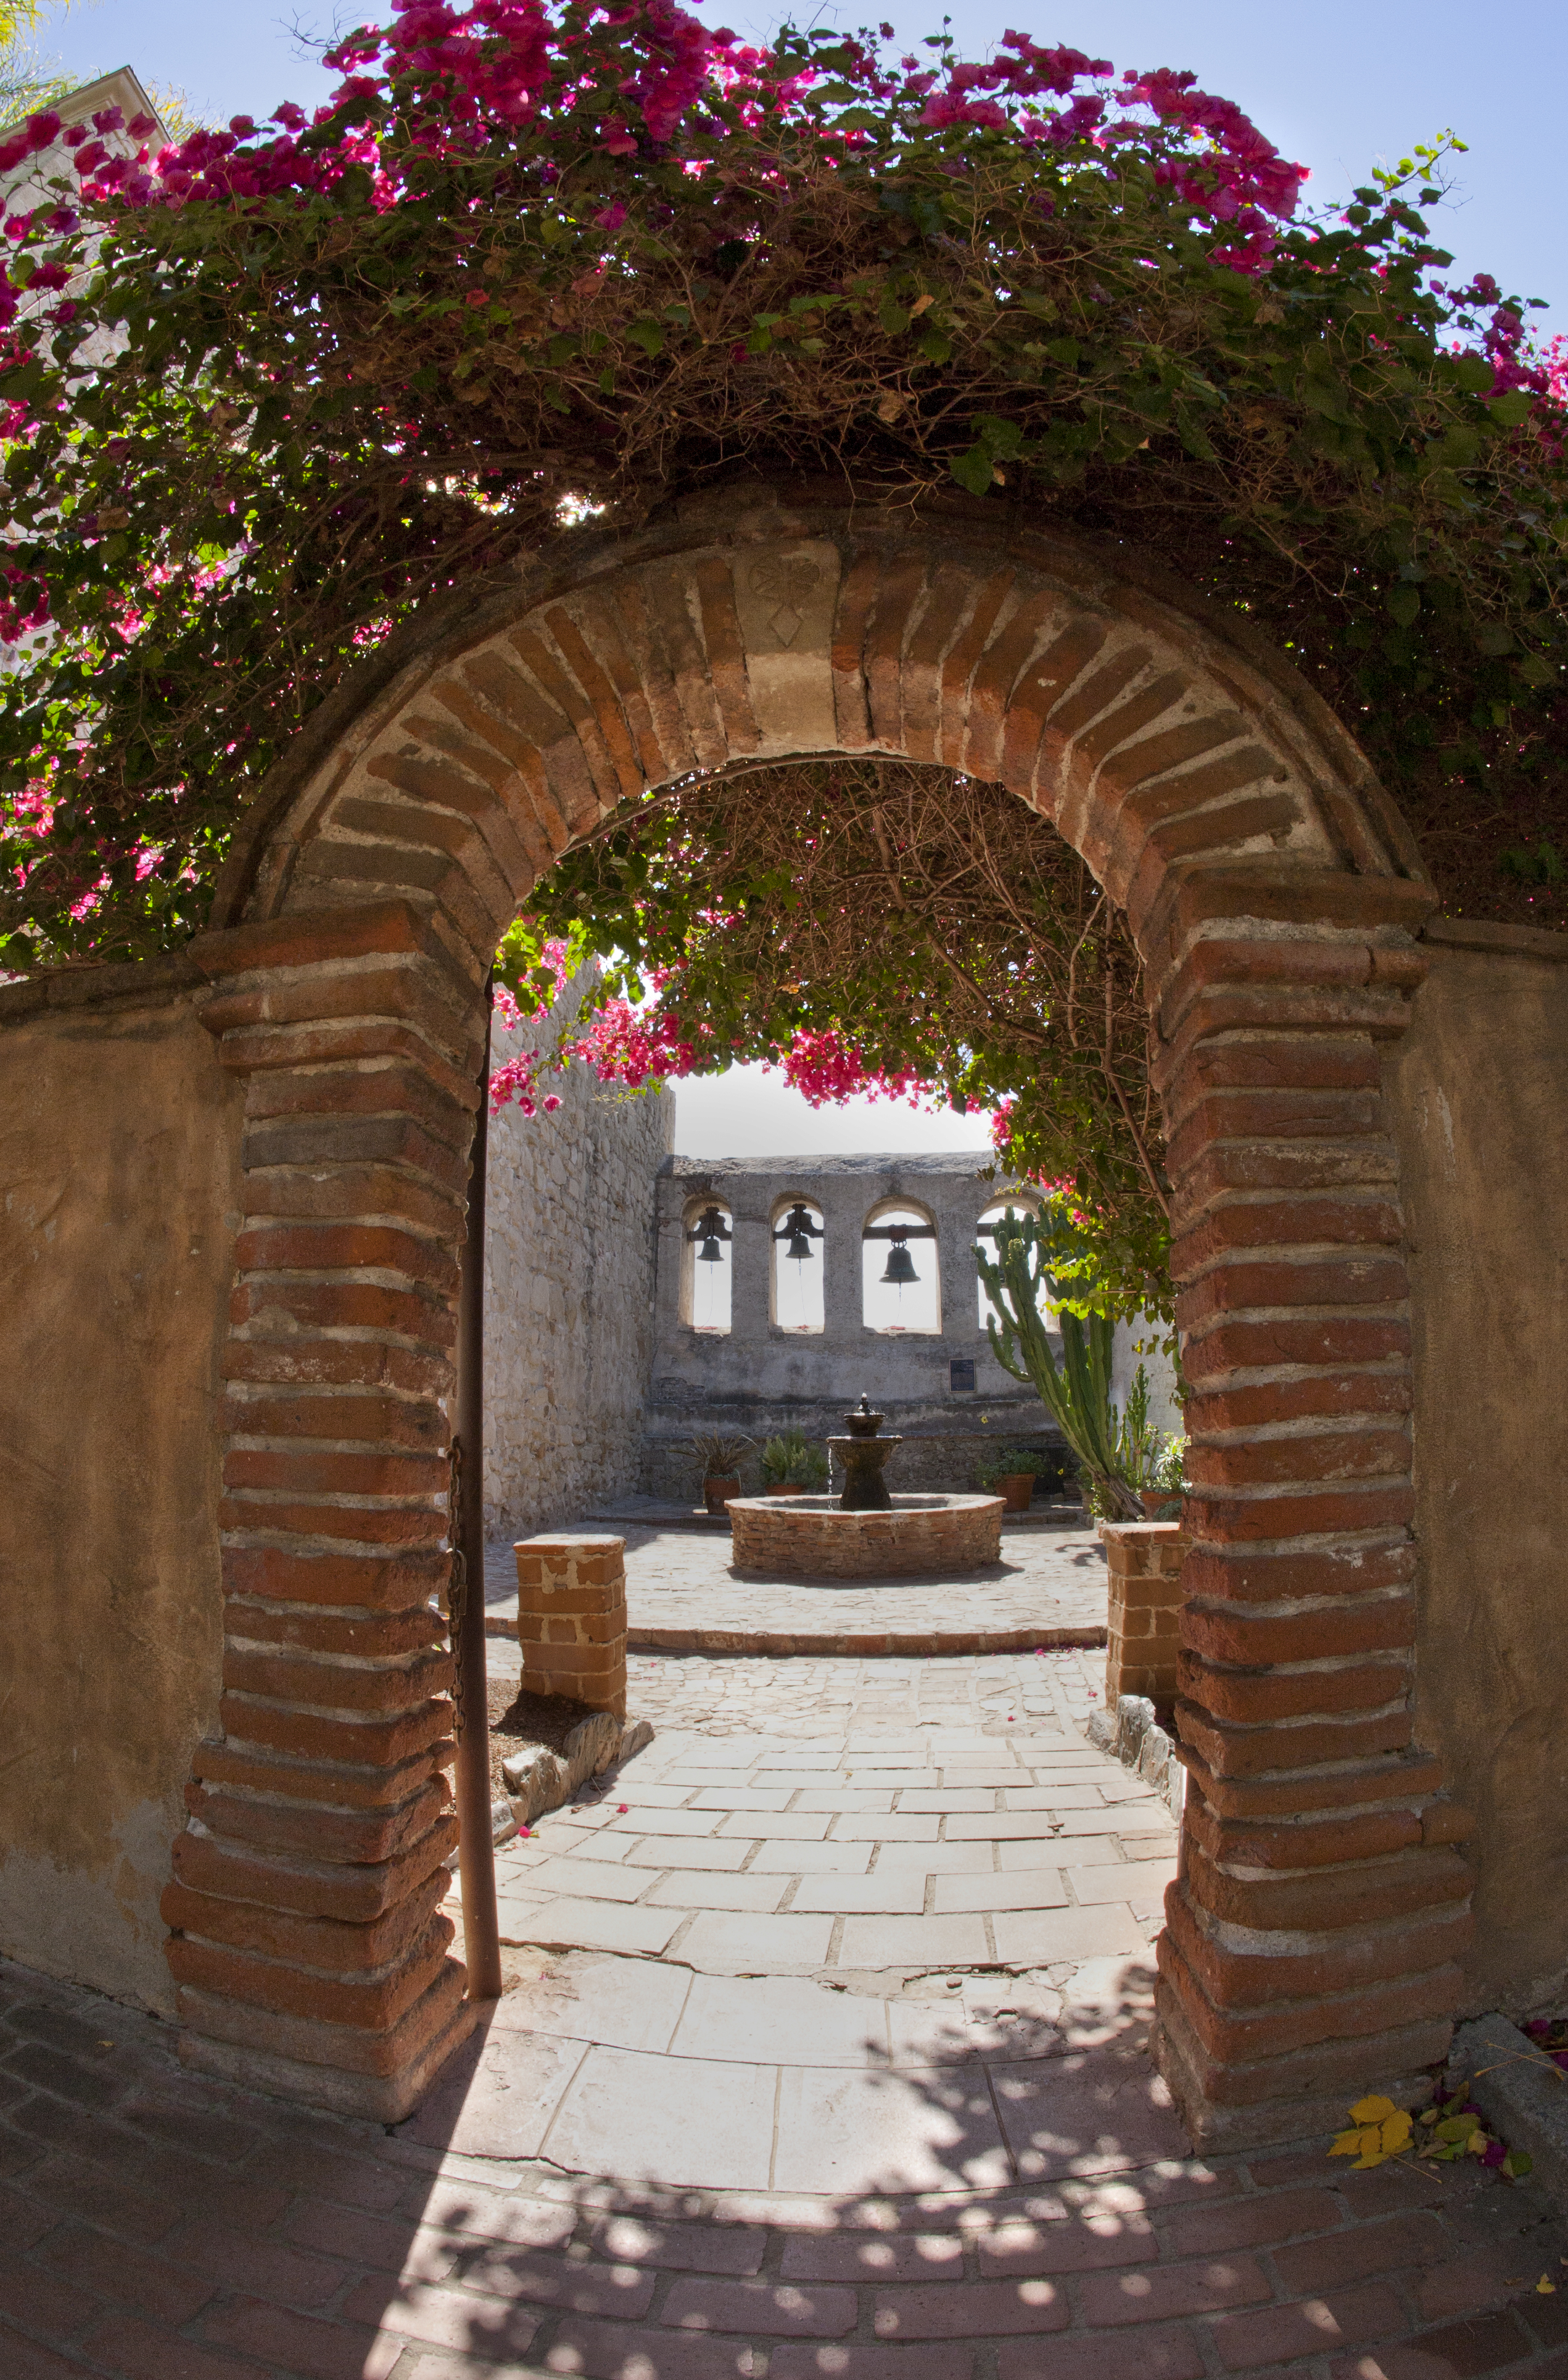 File:Sacred Garden San Juan Capistrano.jpg - Wikimedia Commons